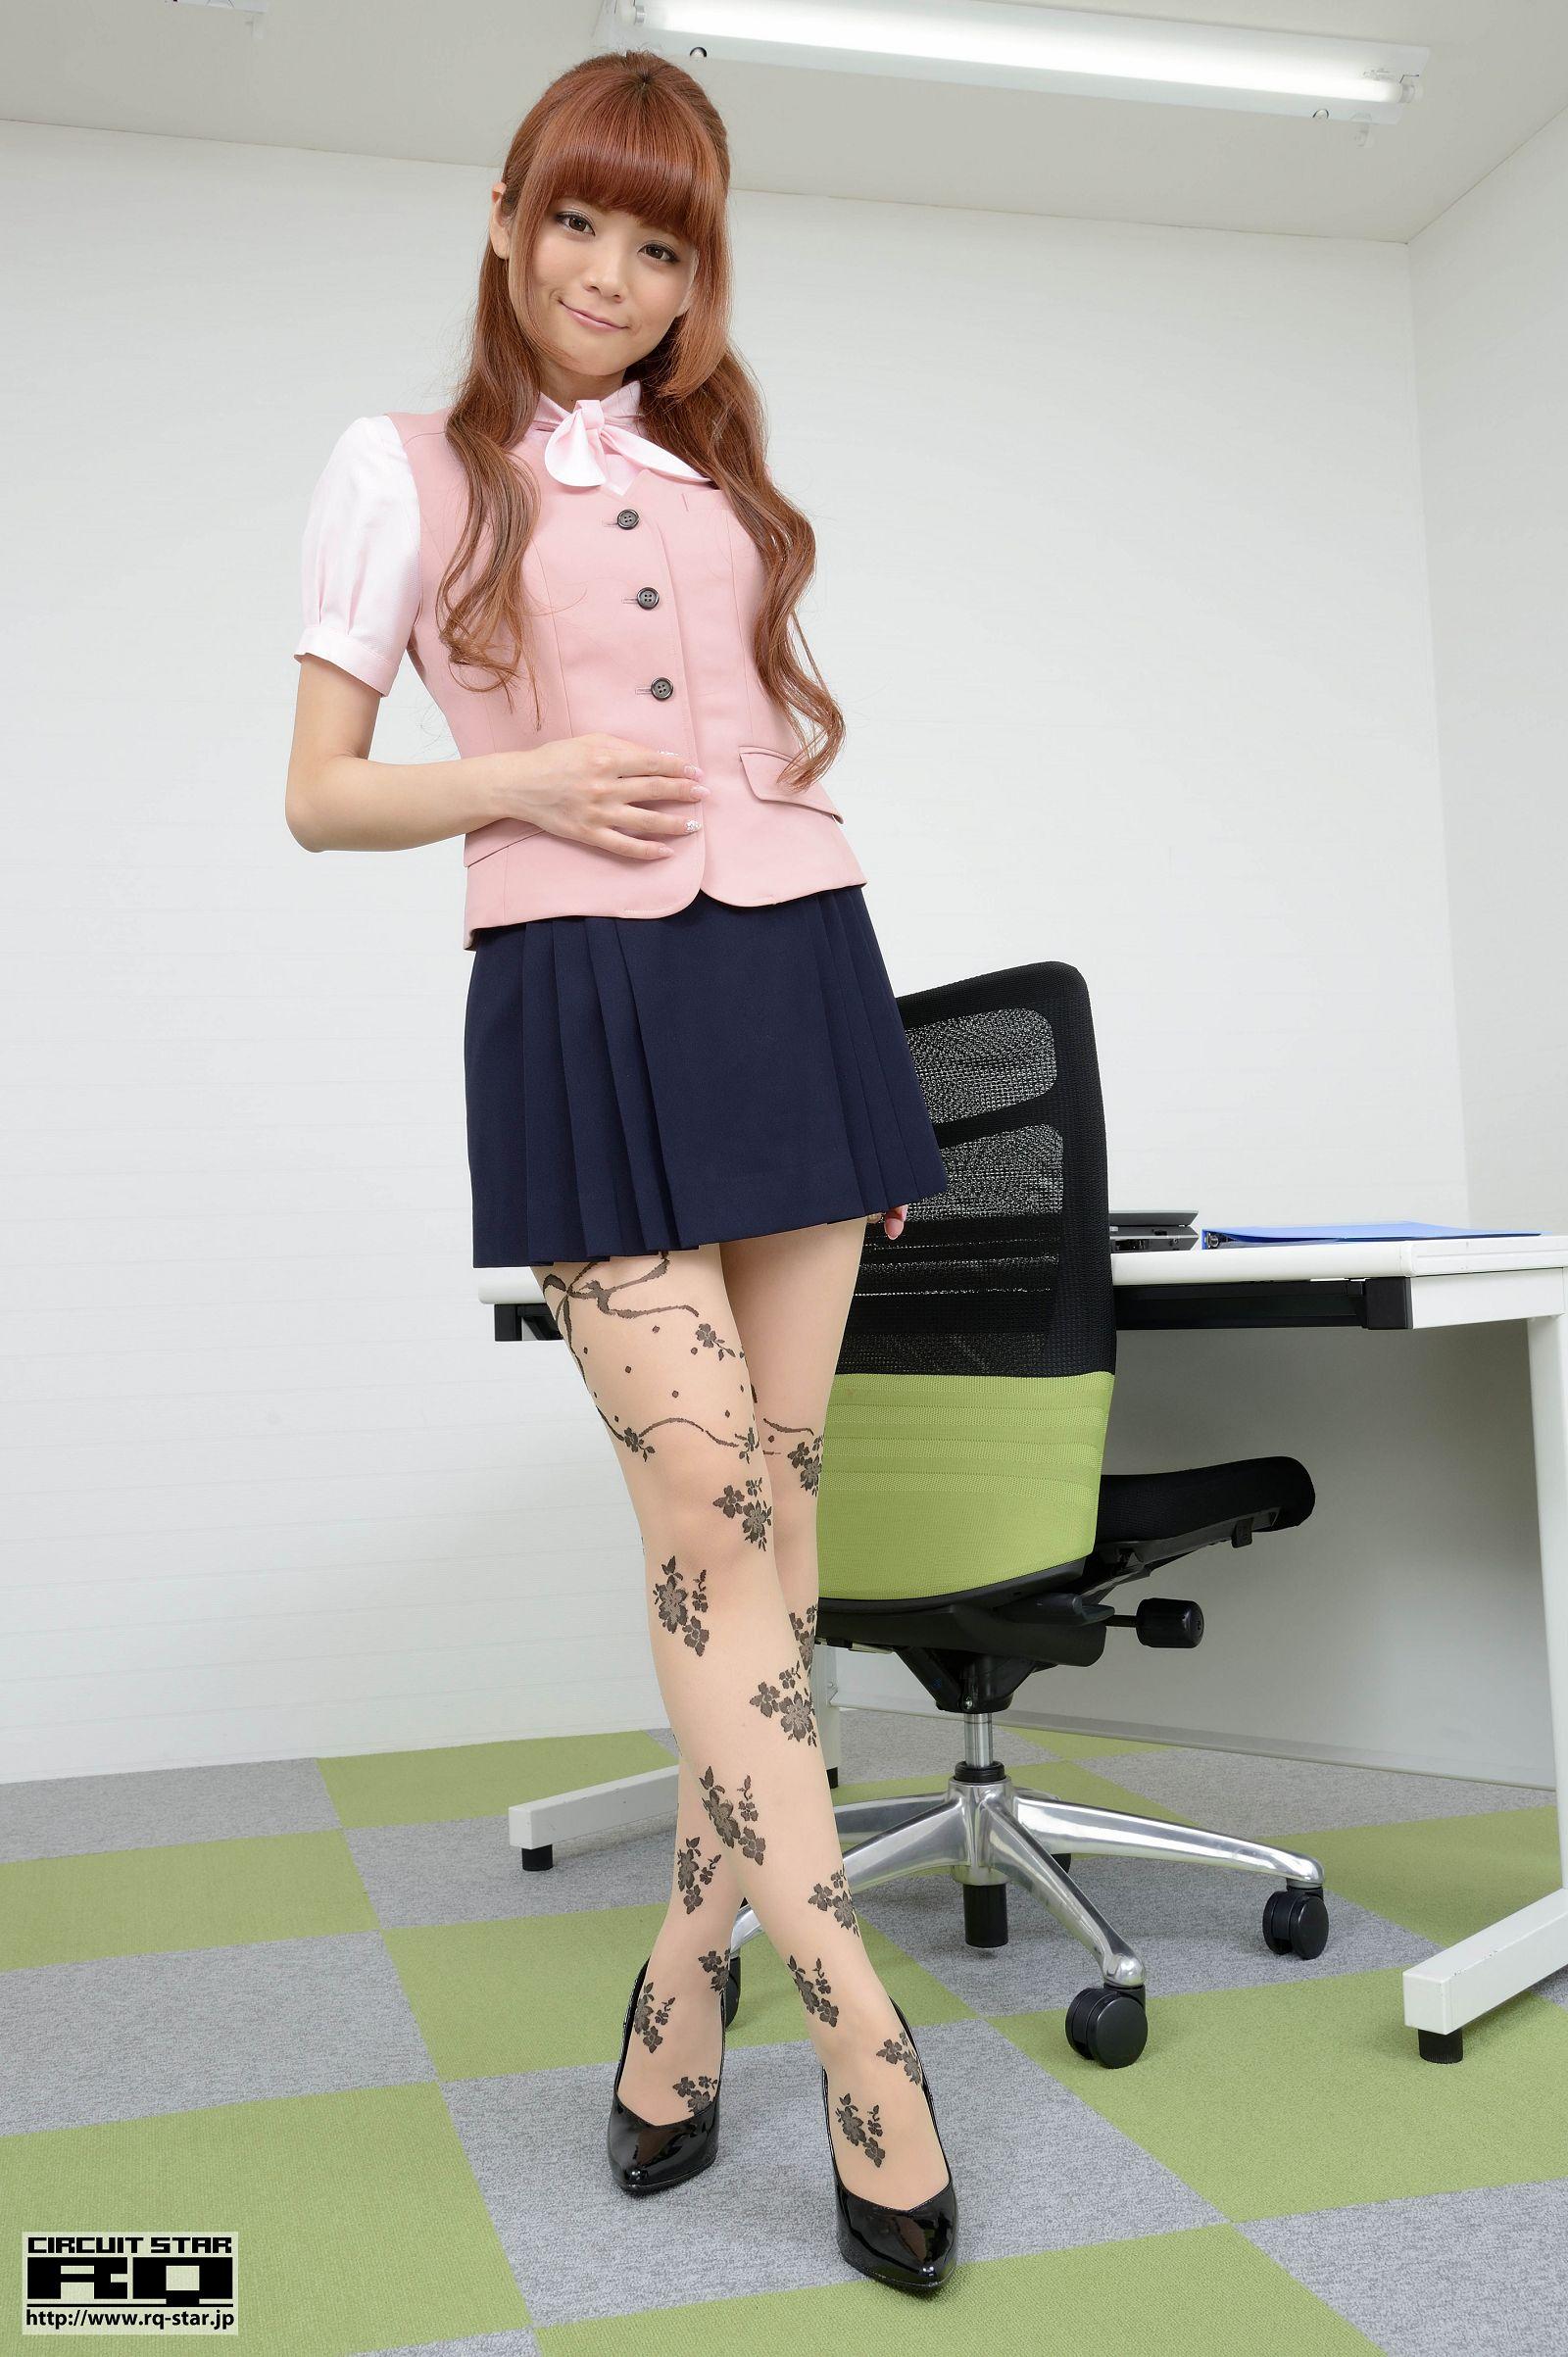 [RQ STAR美女] NO.00832 Aine Sayuka 朔矢あいね Office Lady[120P] RQ STAR 第1张